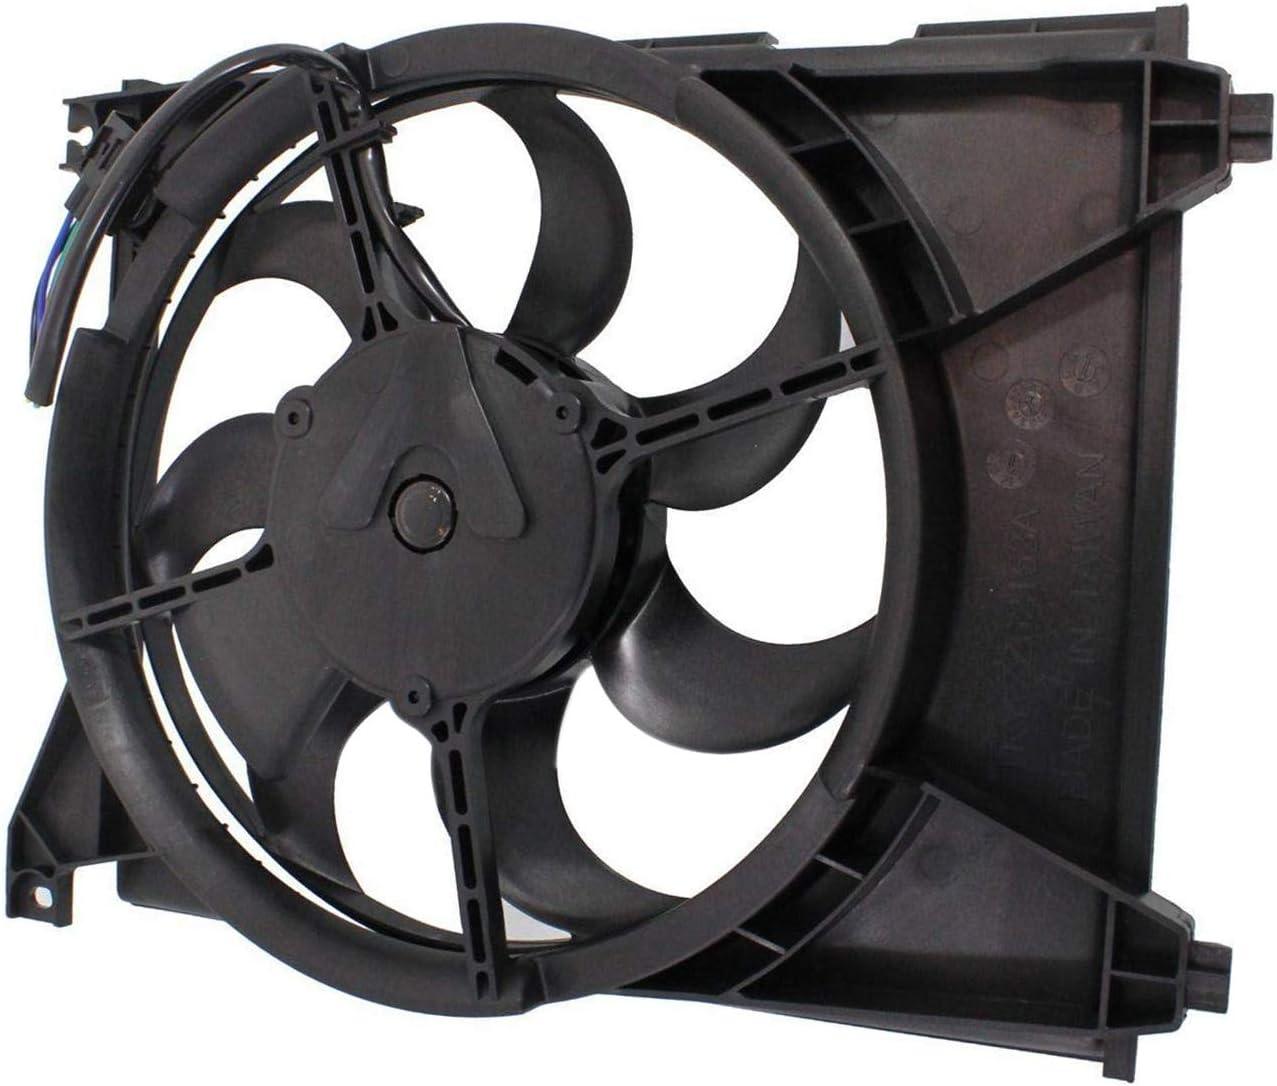 TOPAZ 97730-38000 A/C Condenser Radiator Cooling Fan Assembly for Hyundai Sonata 1999-2004 Kia Optima 2001-2006